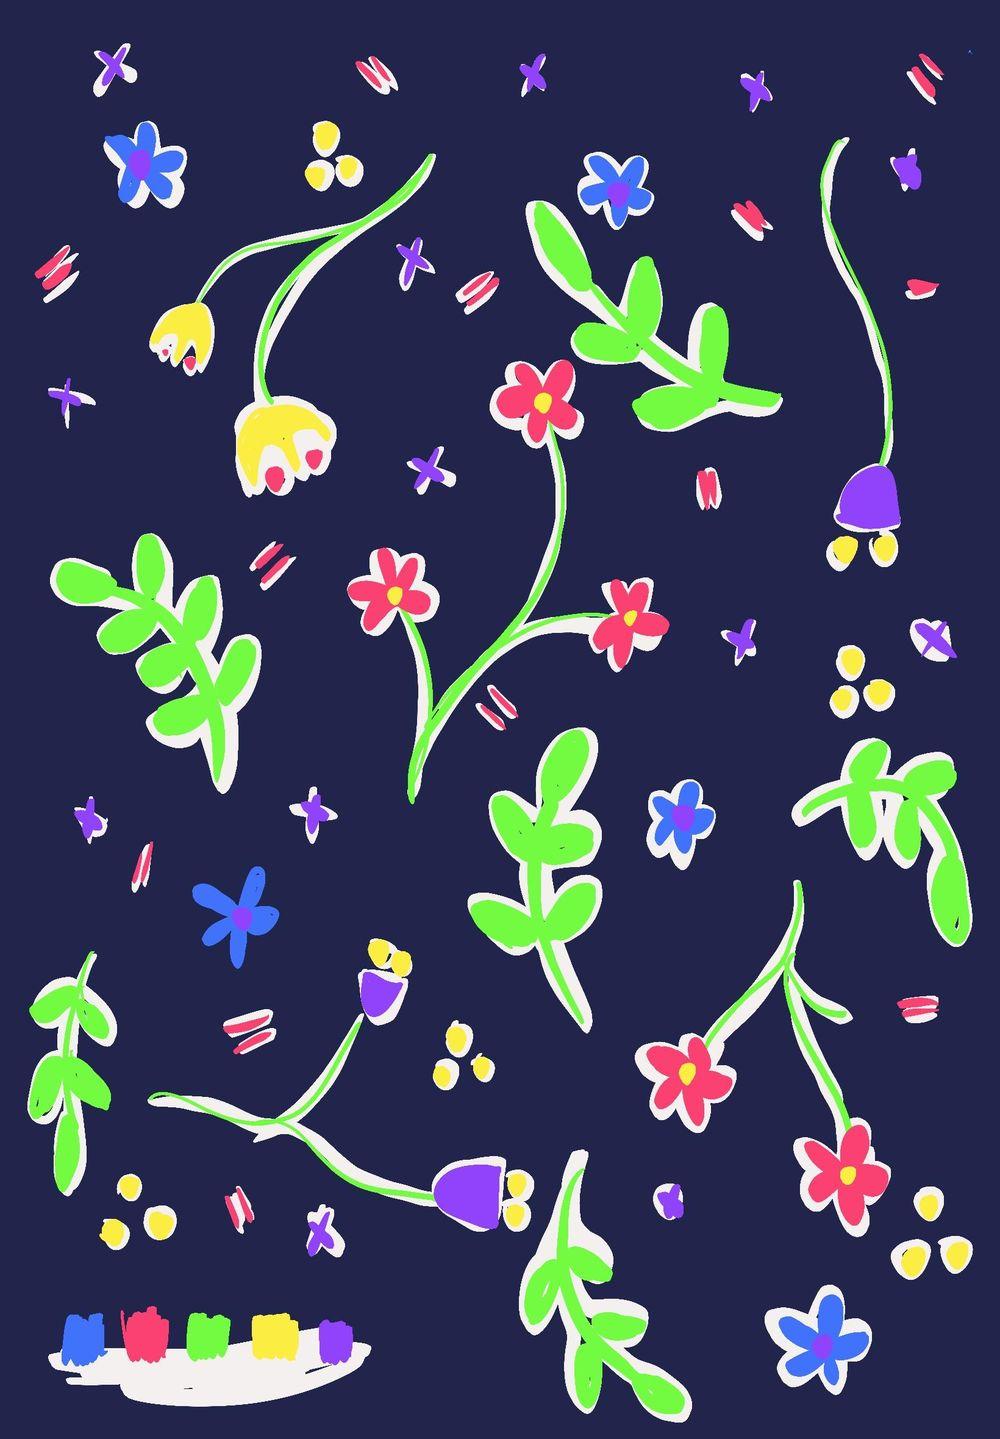 My folk flowers (work in progress) - image 3 - student project